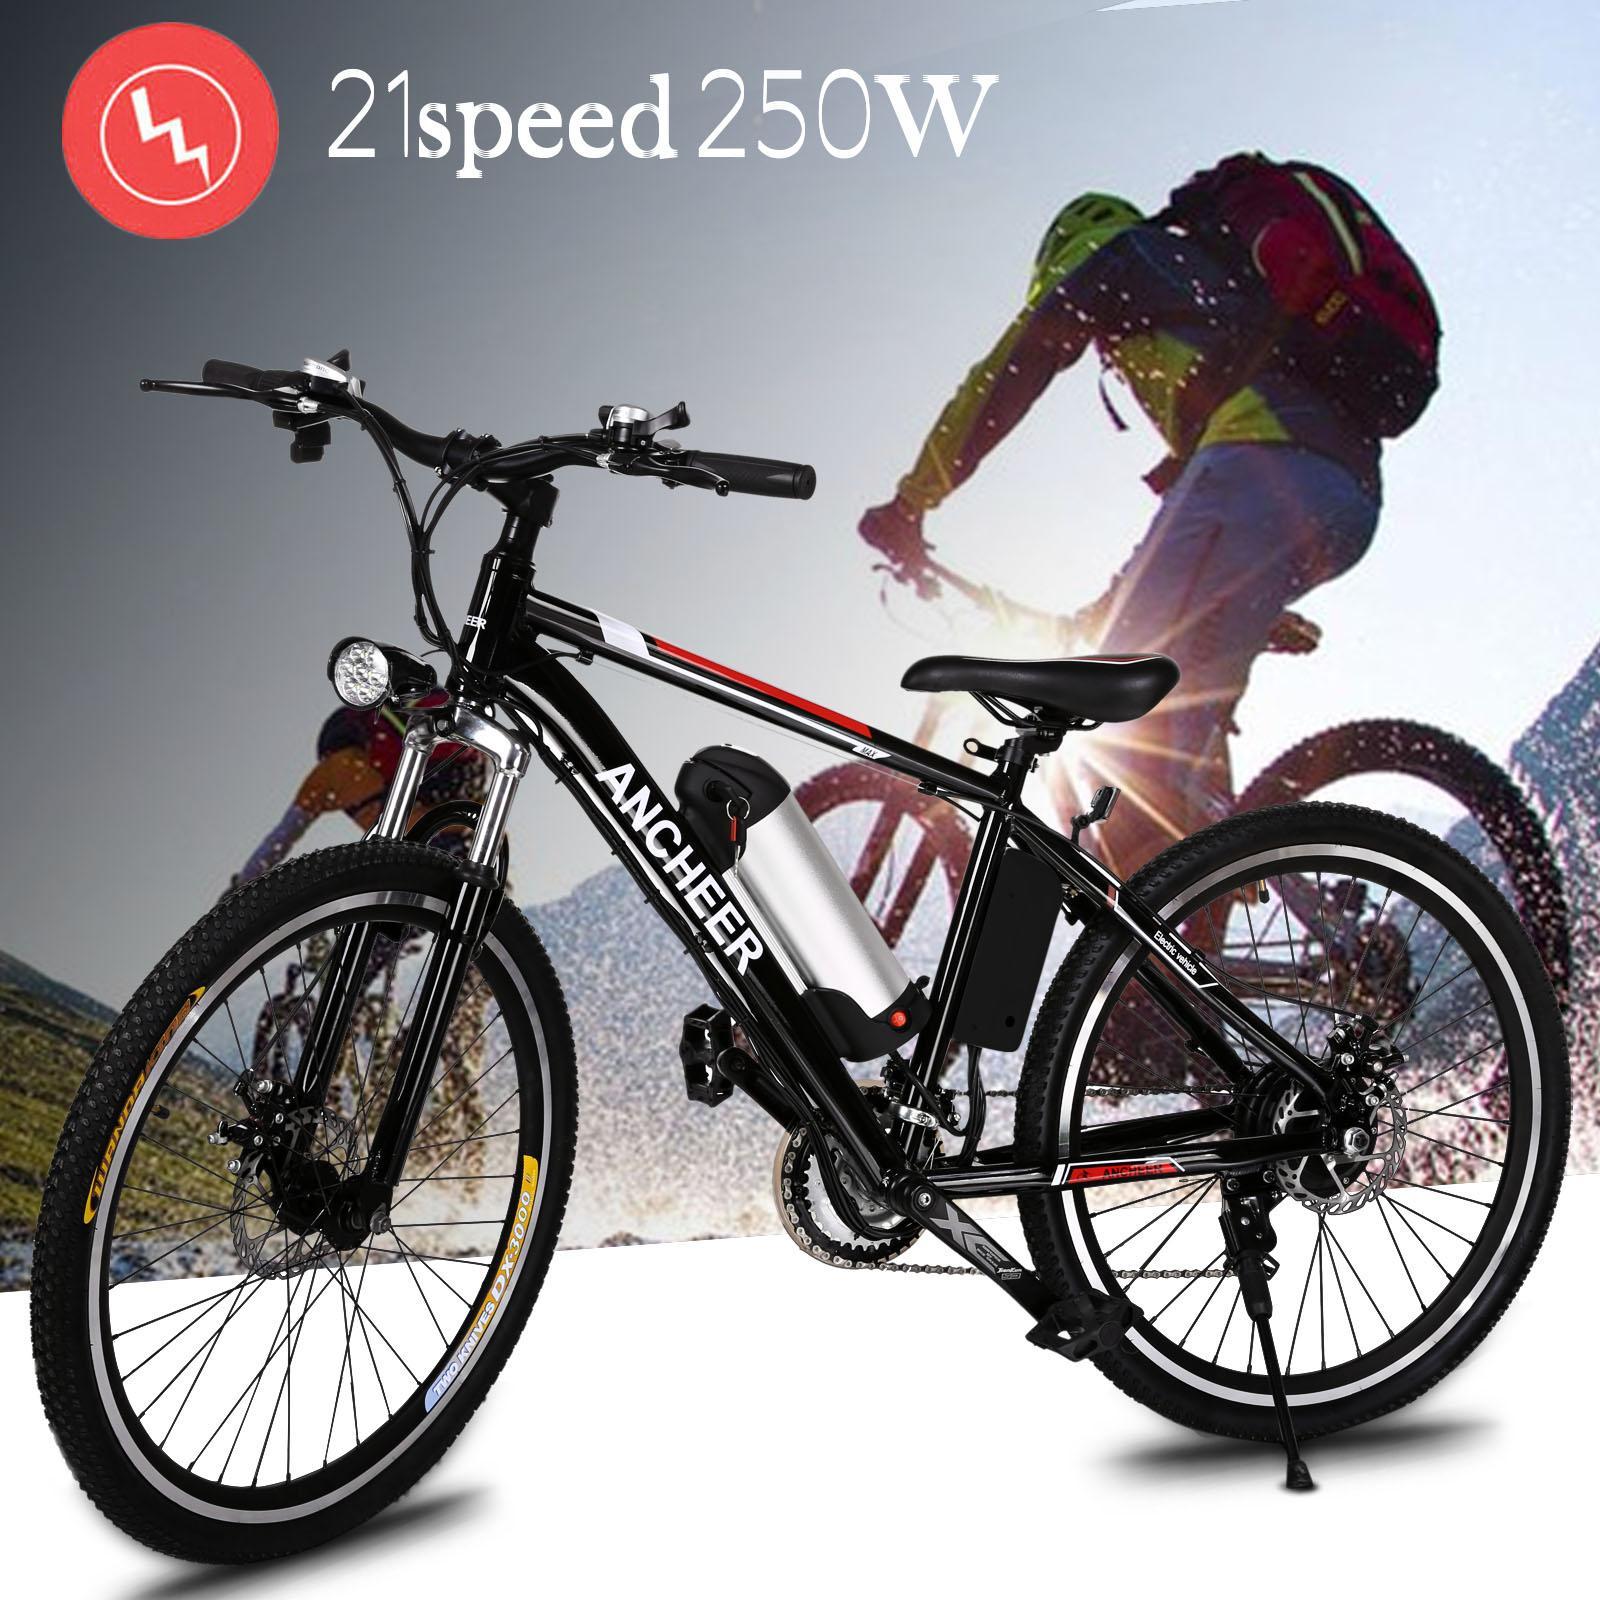 "Elecmall 25"" Power Electric Bike Mountain Folding Bicycle w/21-Speed Transmission System Elec"